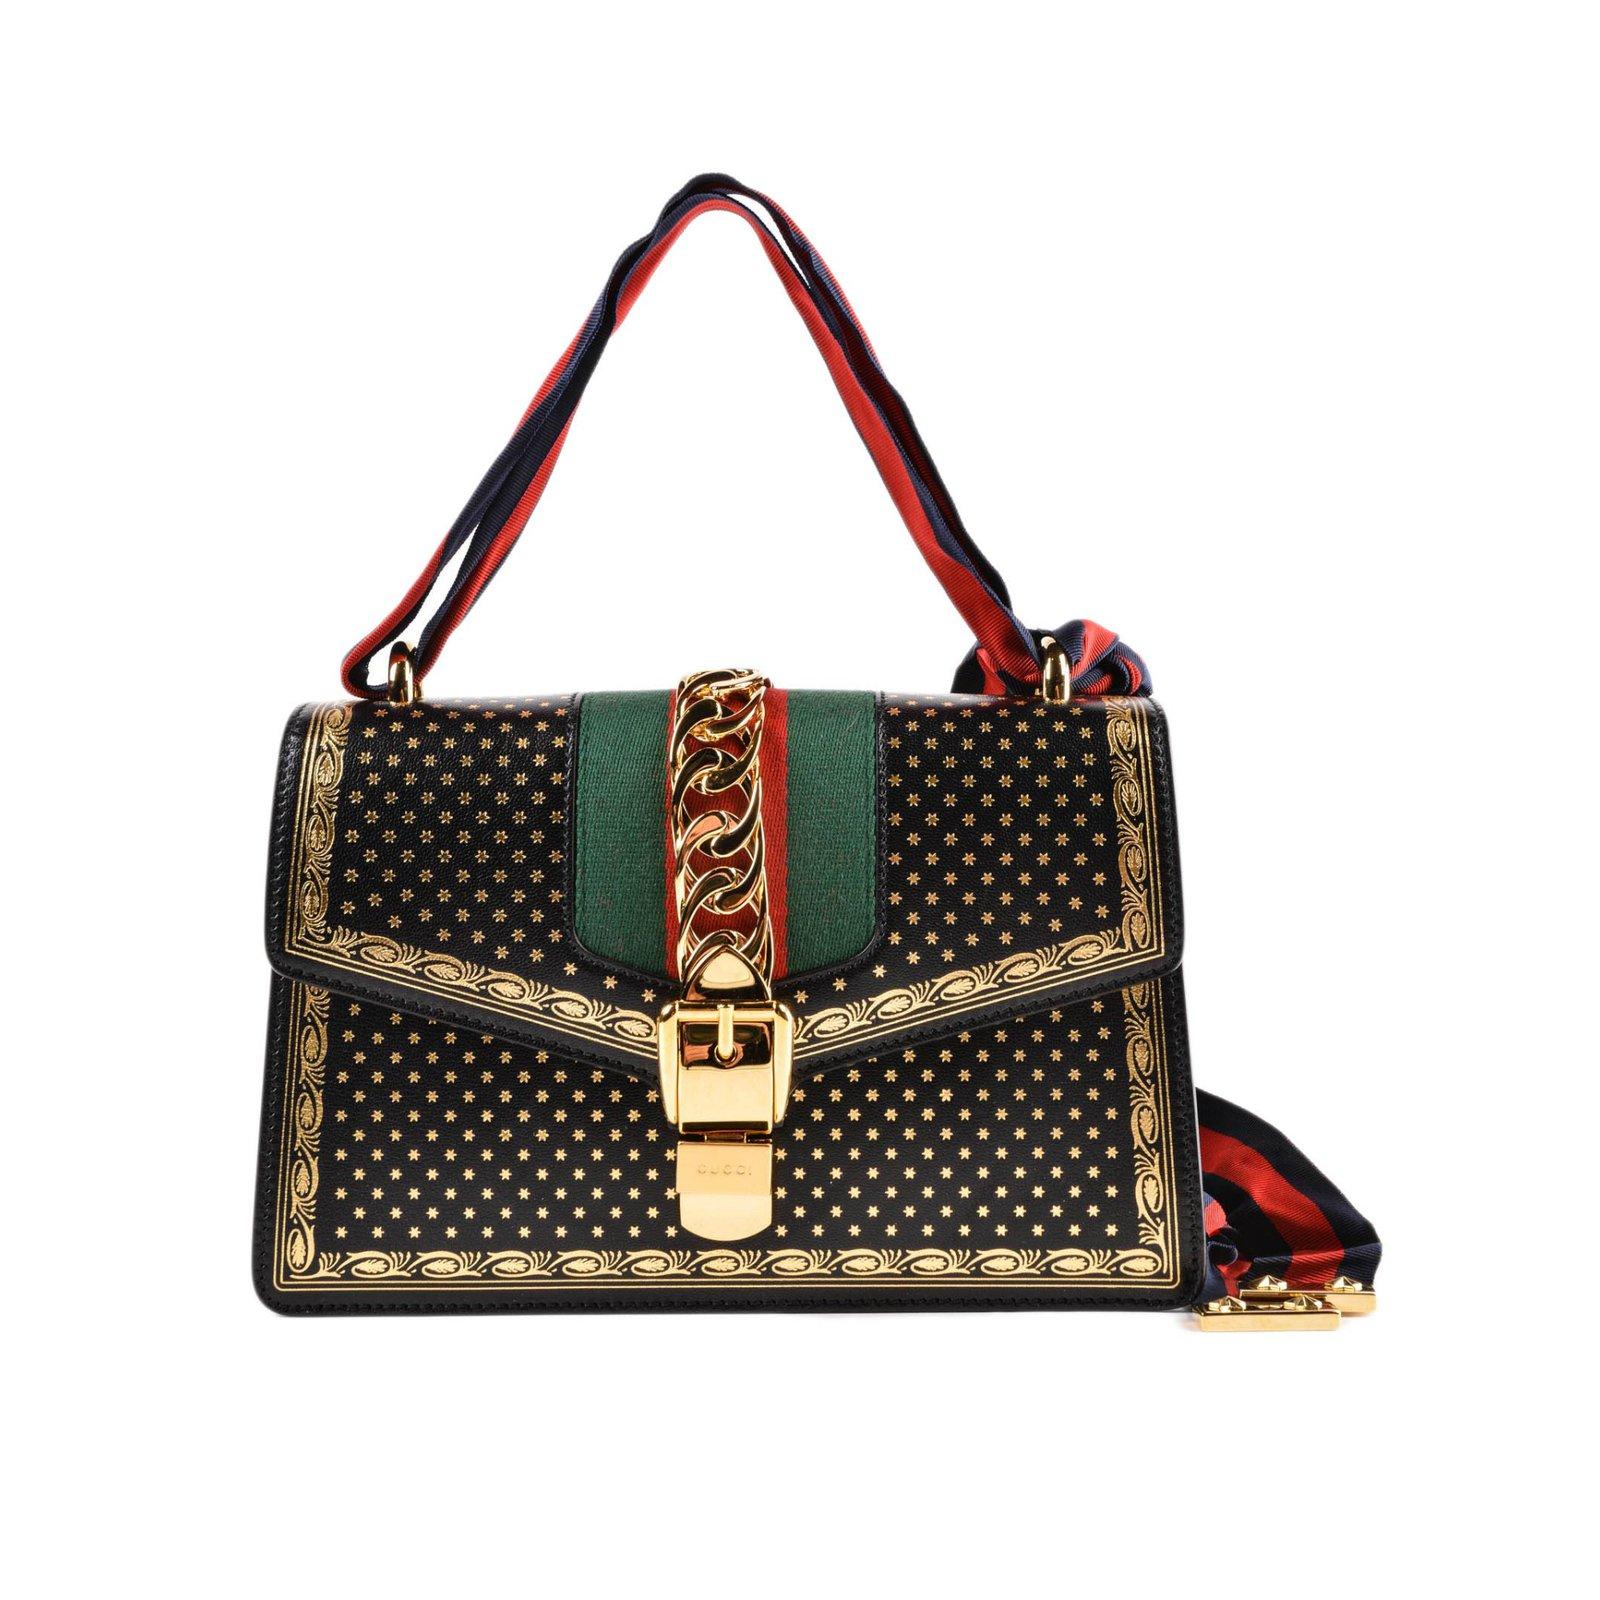 dd781690fdbd Sacs à main Gucci Sylvie Cuir Noir ref.70736 - Joli Closet